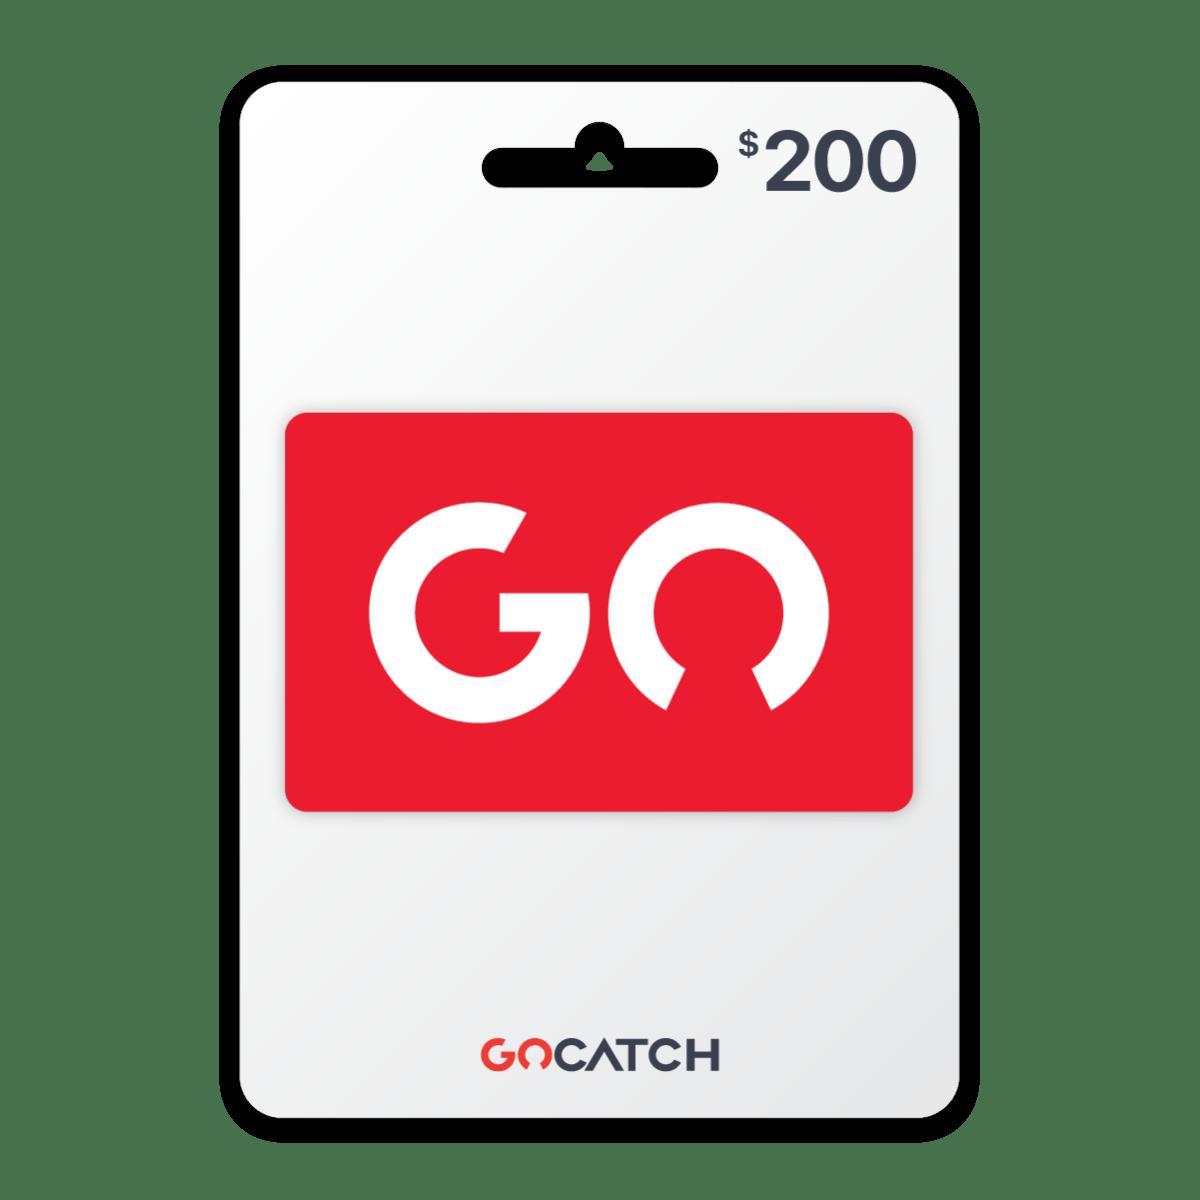 $200 Gift Card 1